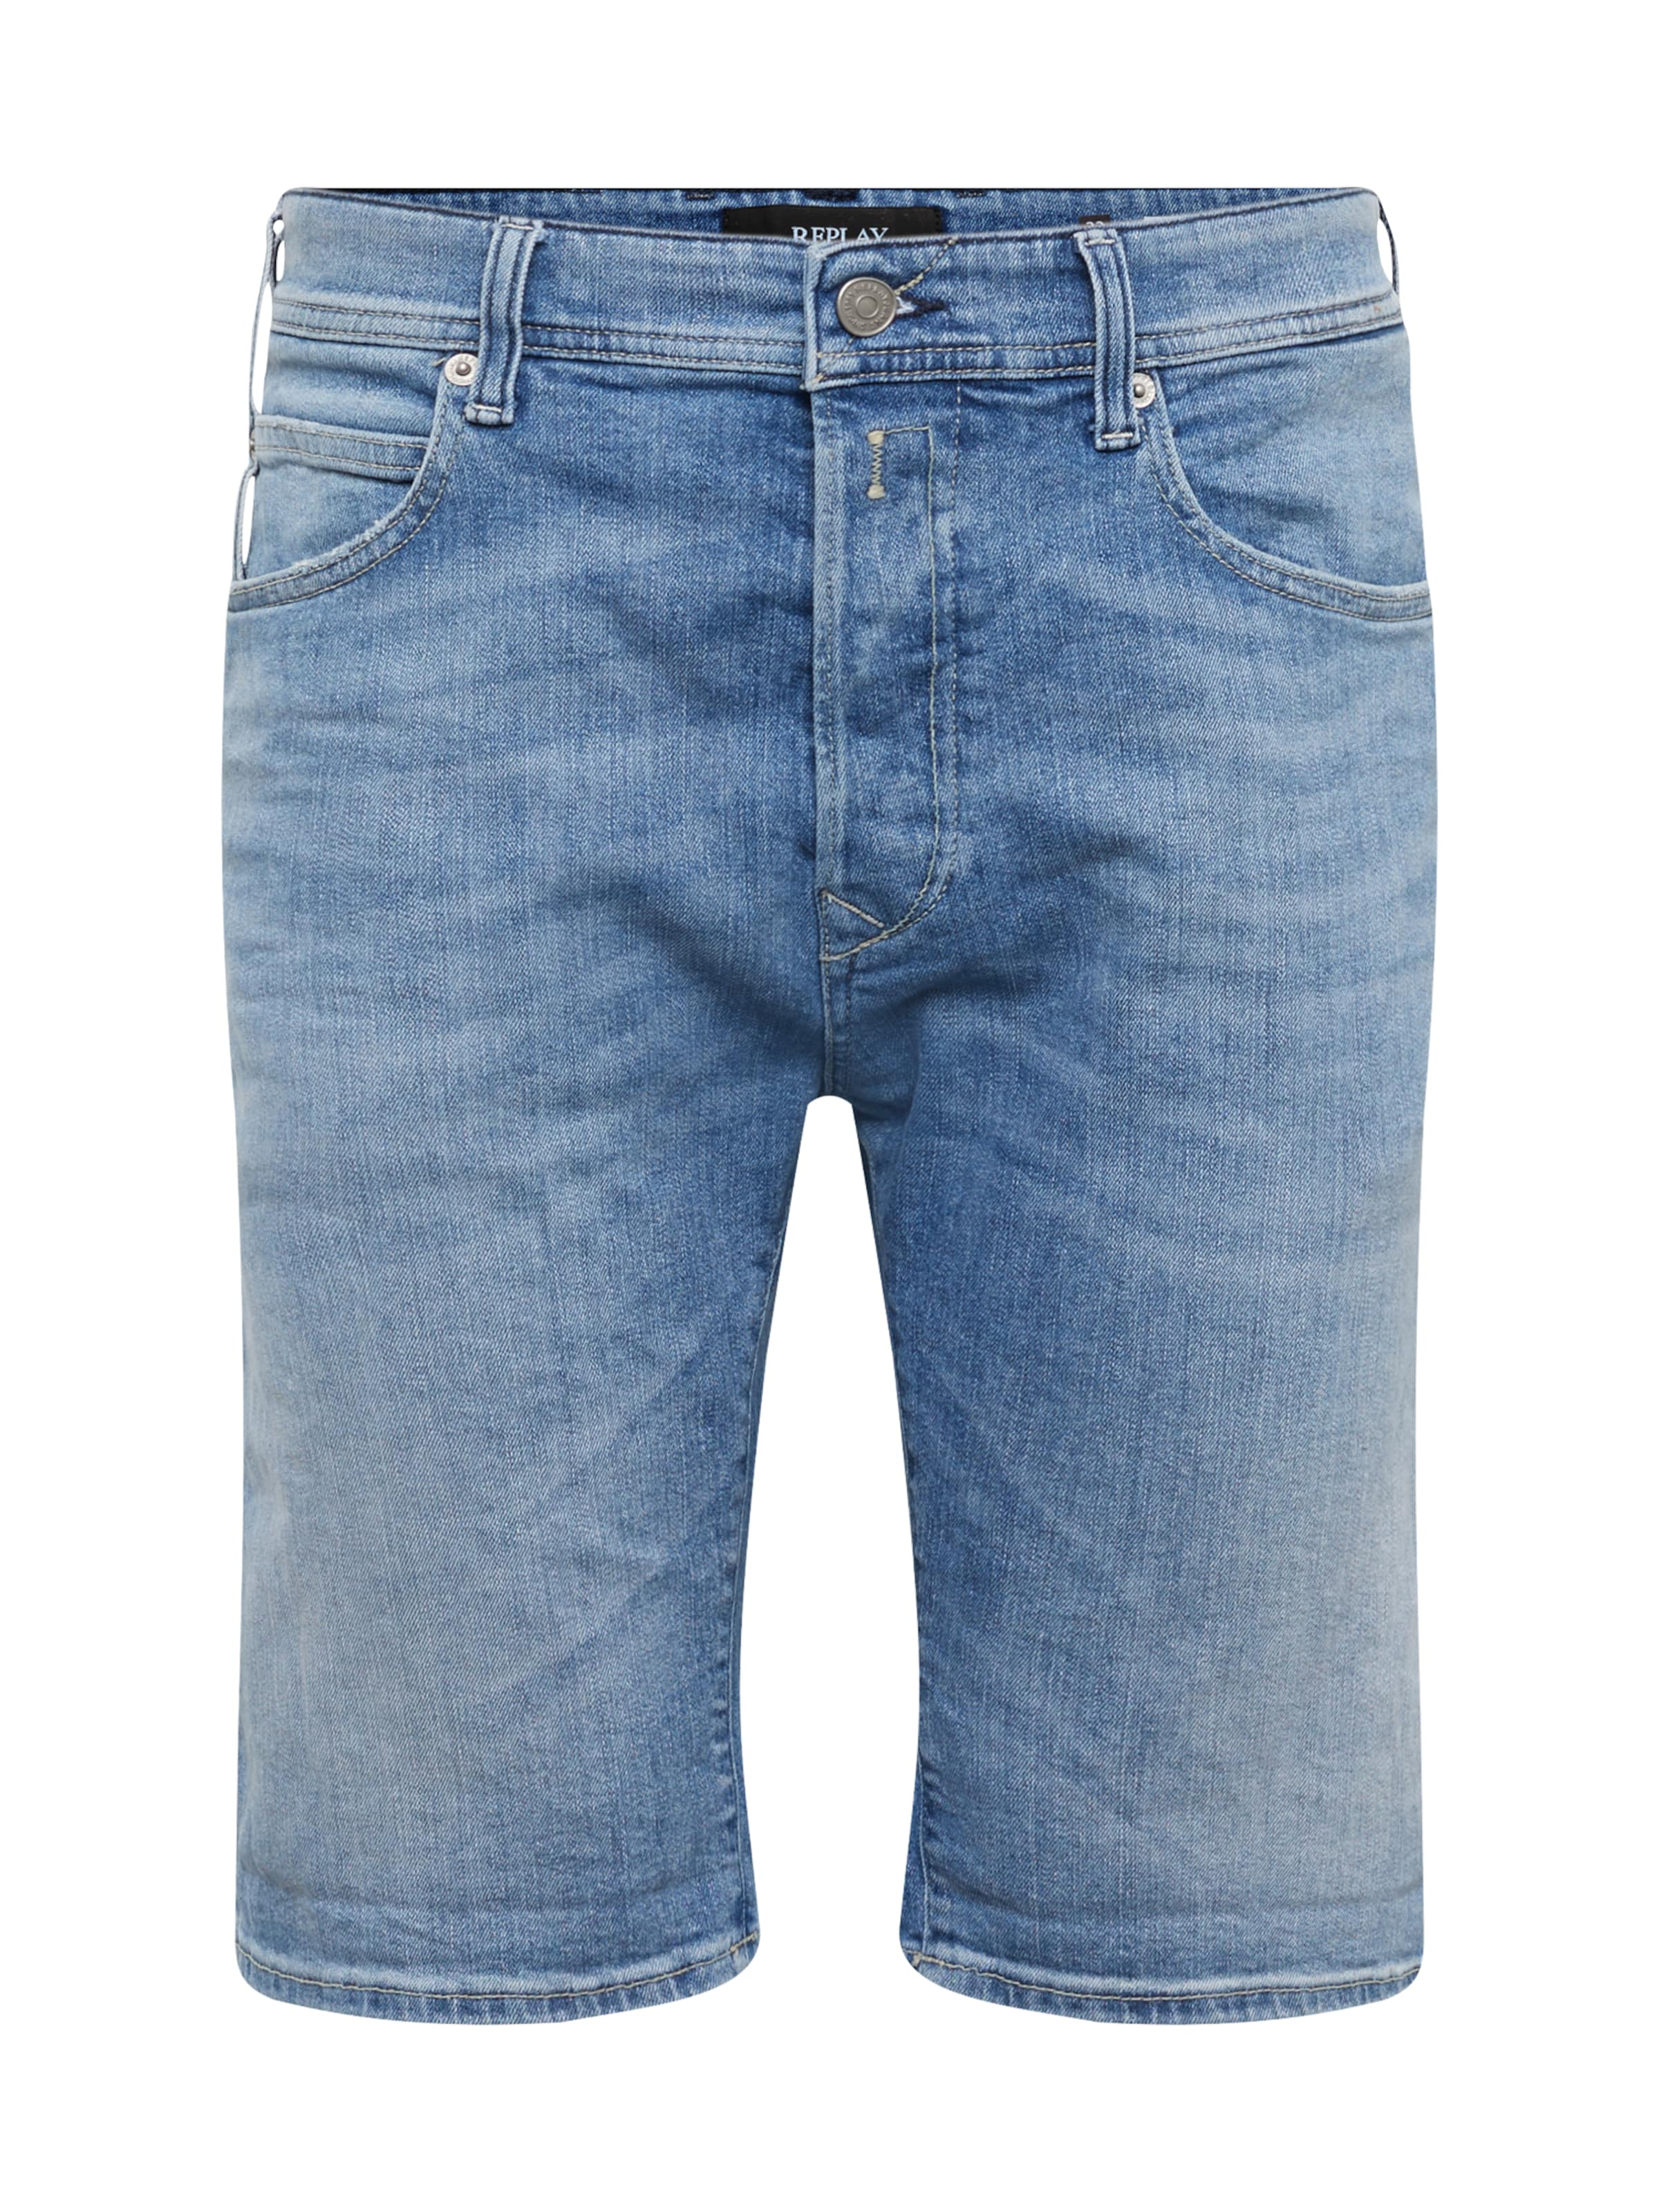 Replay Gris Jean 'rbj En 901 shorts' Denim 4jLcRA35q